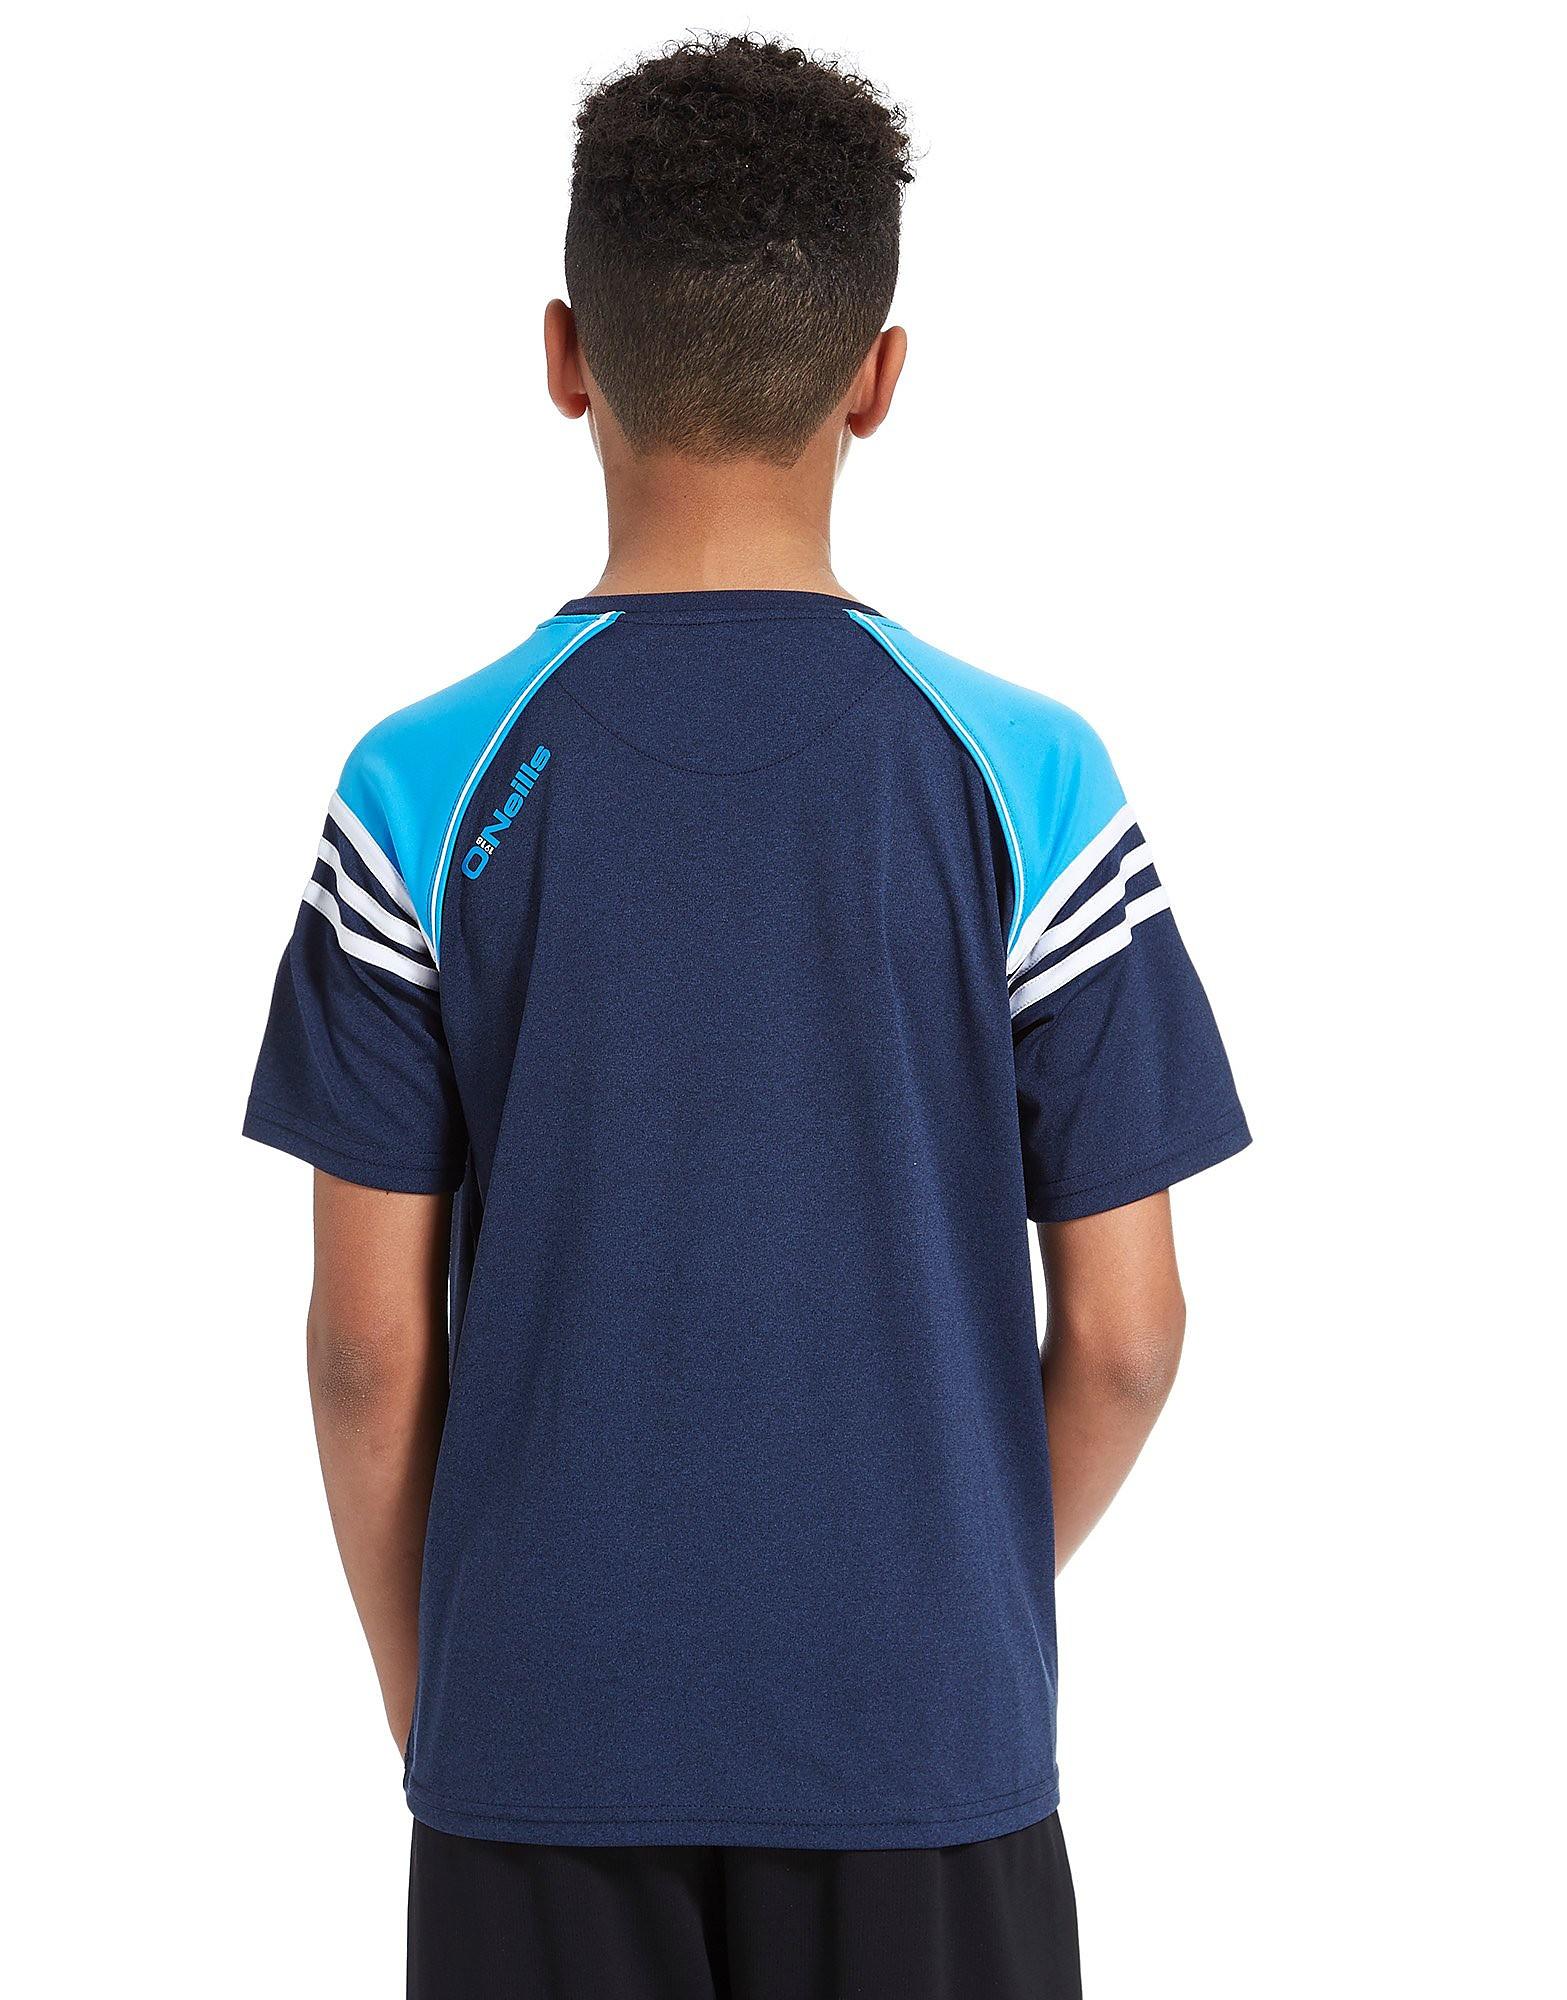 O'Neills Dublin T-Shirt Junior